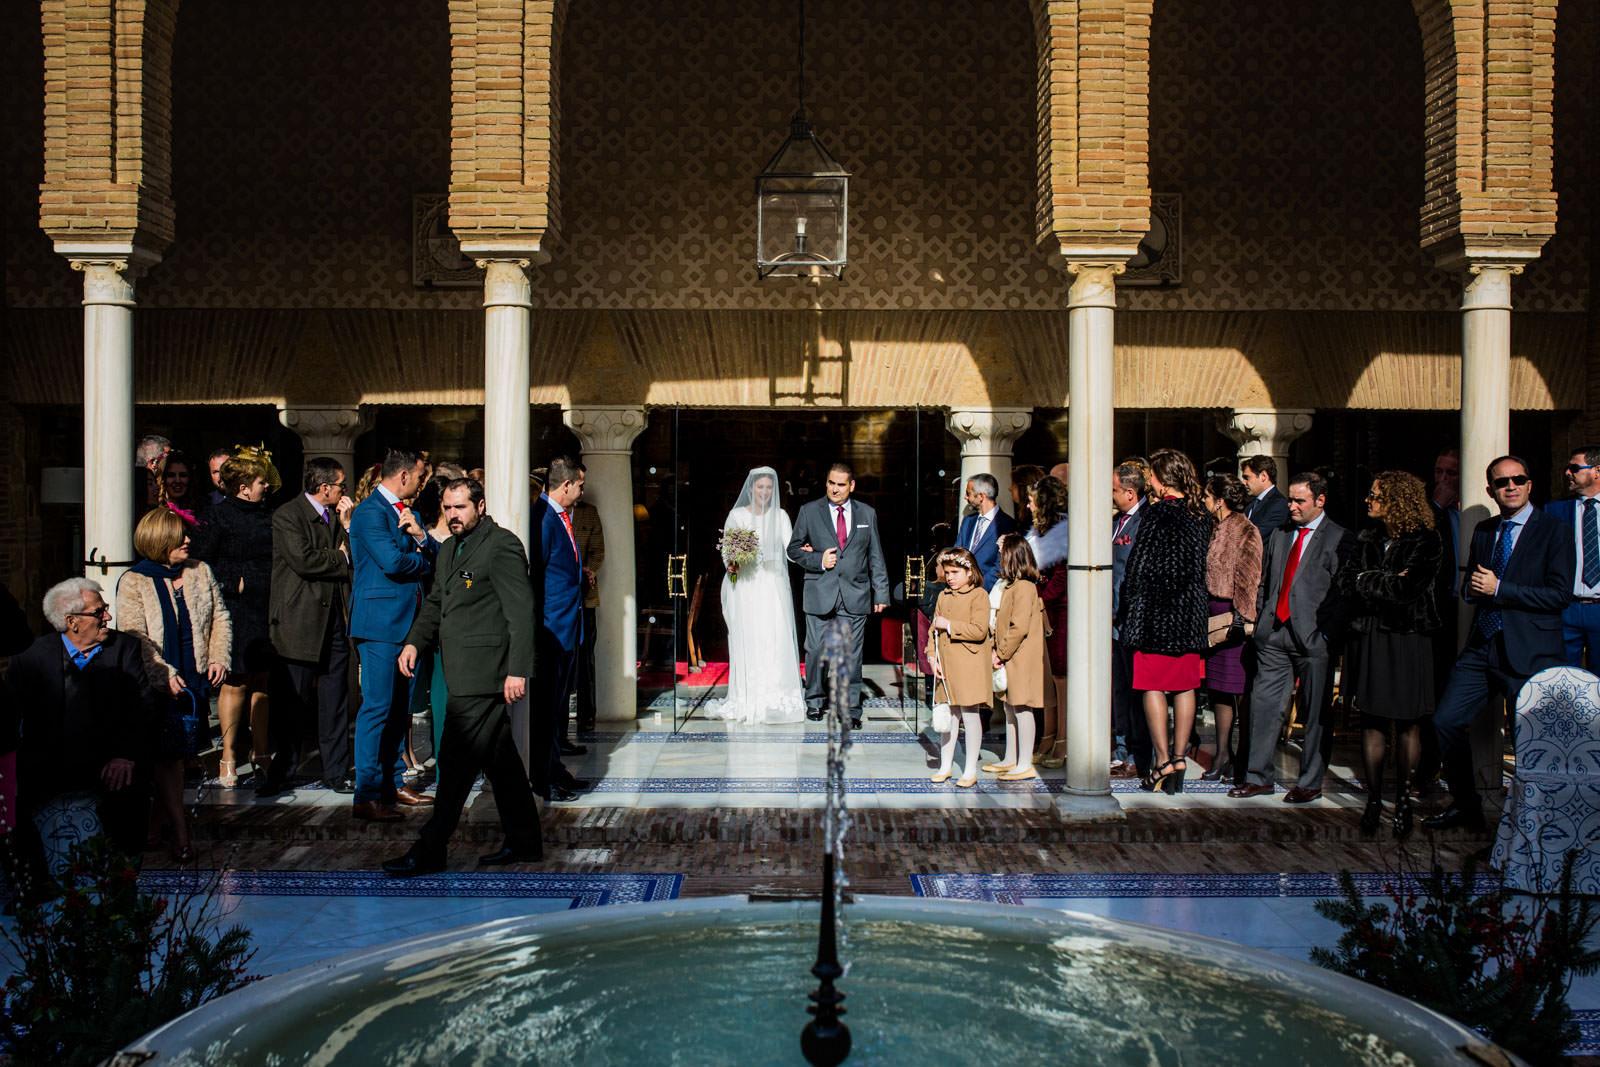 Wedroads-Boda-Sevilla-Parador-Carmona-bridal-engagement-Rafael-Torres-fotografo-bodas-sevilla-madrid-barcelona-wedding-photographer--34.jpg